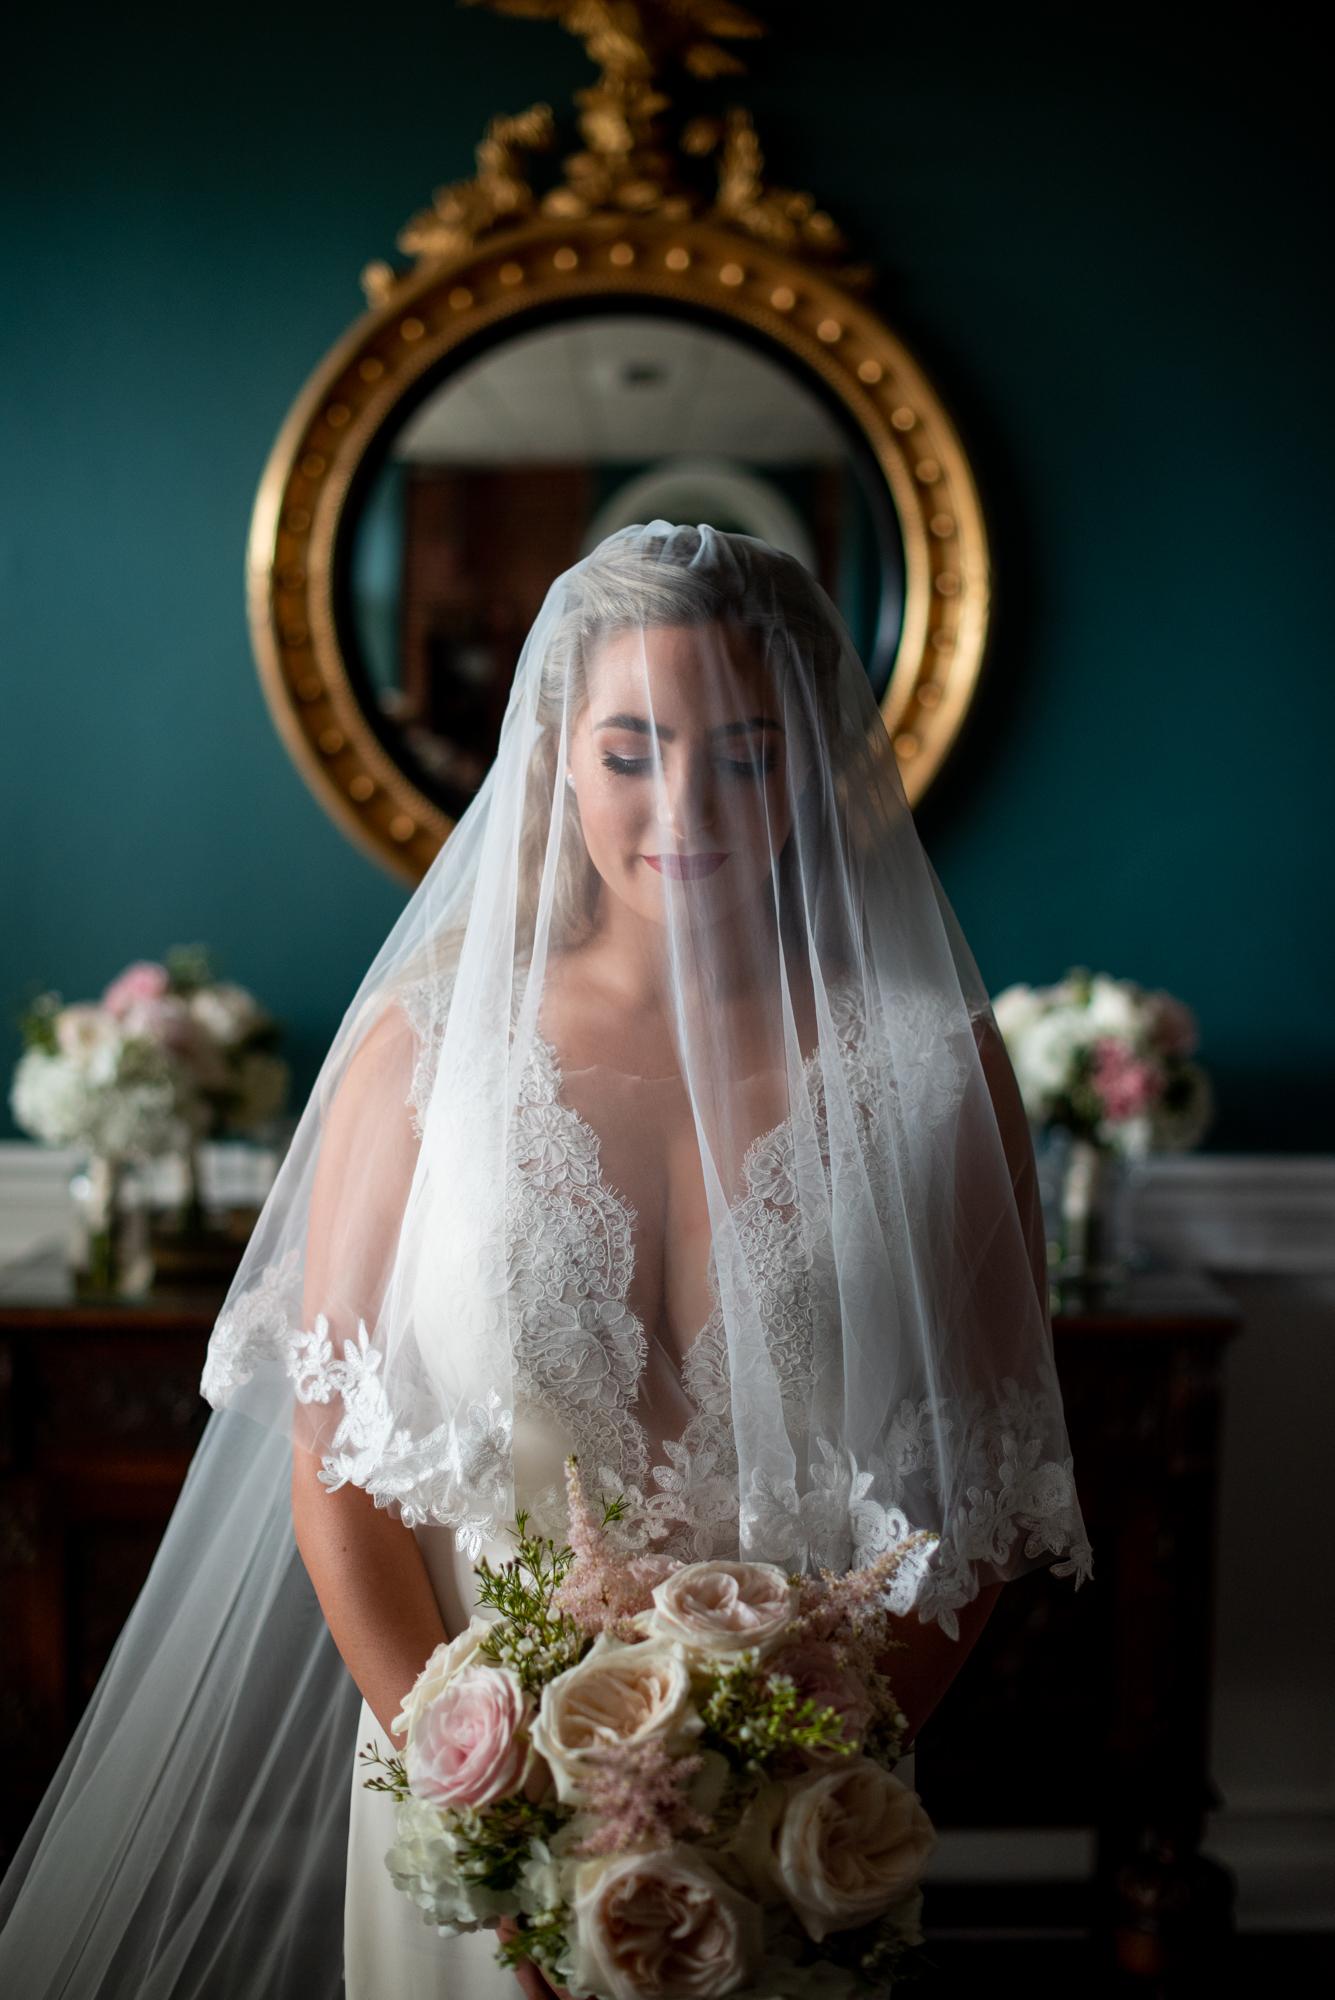 st-augustine-photographer-st-augustine-gay-wedding-sam-sex-wedding-photographer-sarah-annay-photography-white-room-weddings-21.jpg